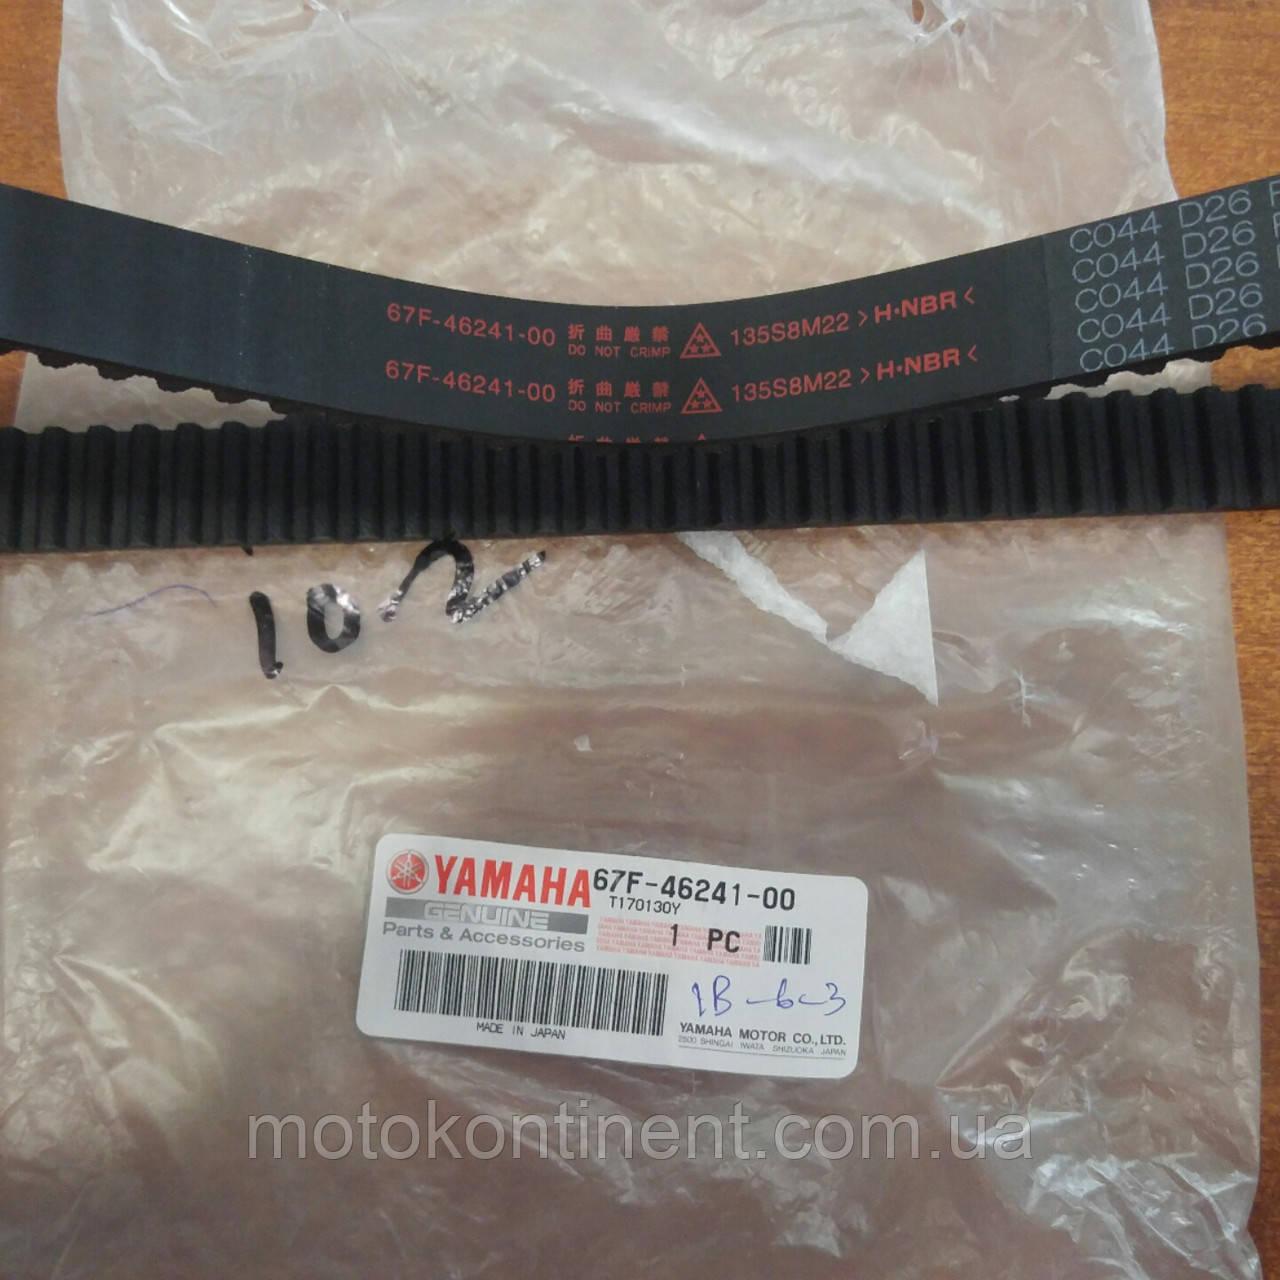 67F-46241-00 Ремень ГРМ Yamaha/Mercury F80/F100/F115